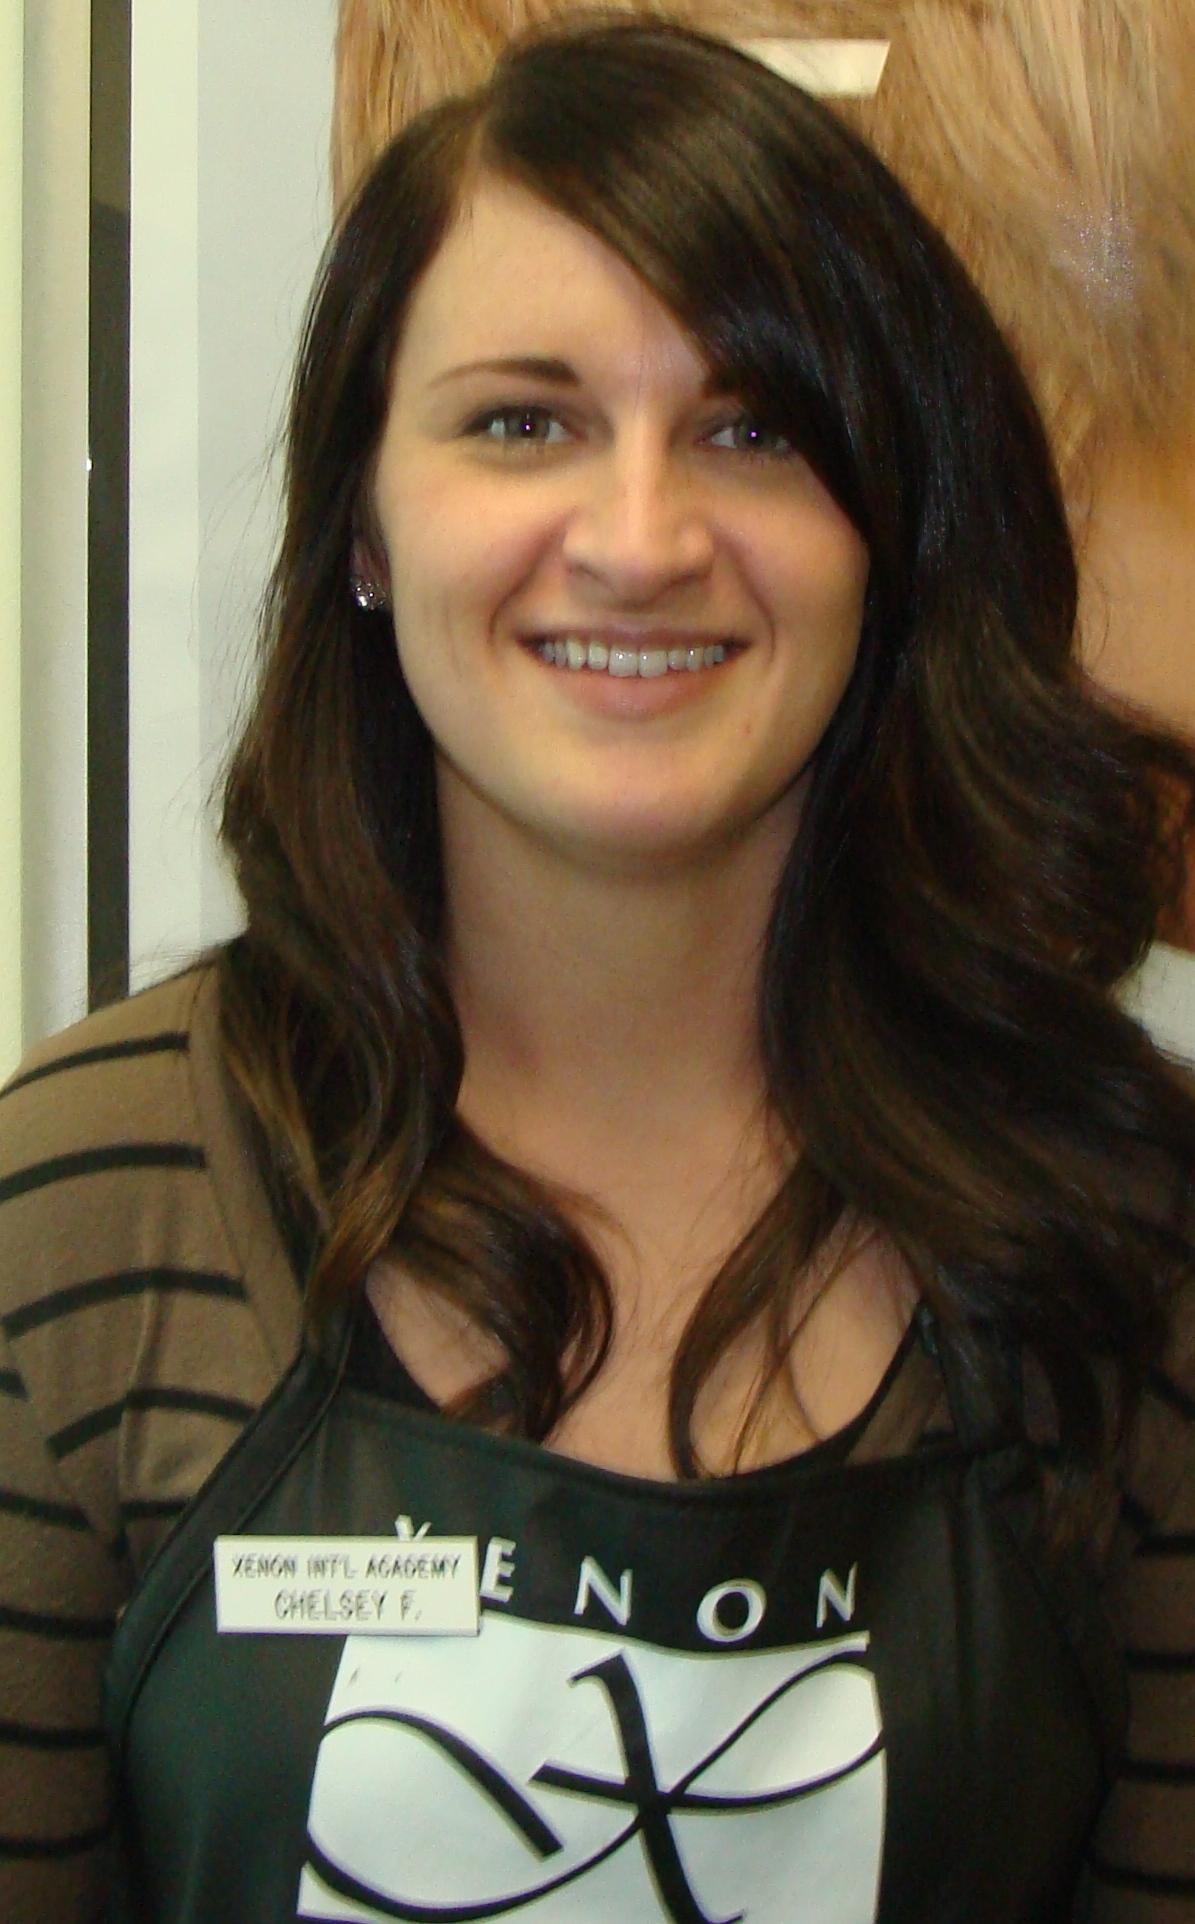 Woman at Xenon Academy